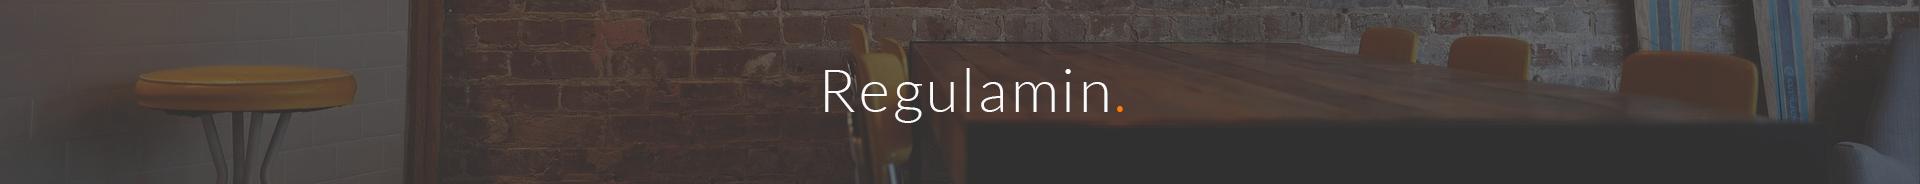 banner-regulamin.png